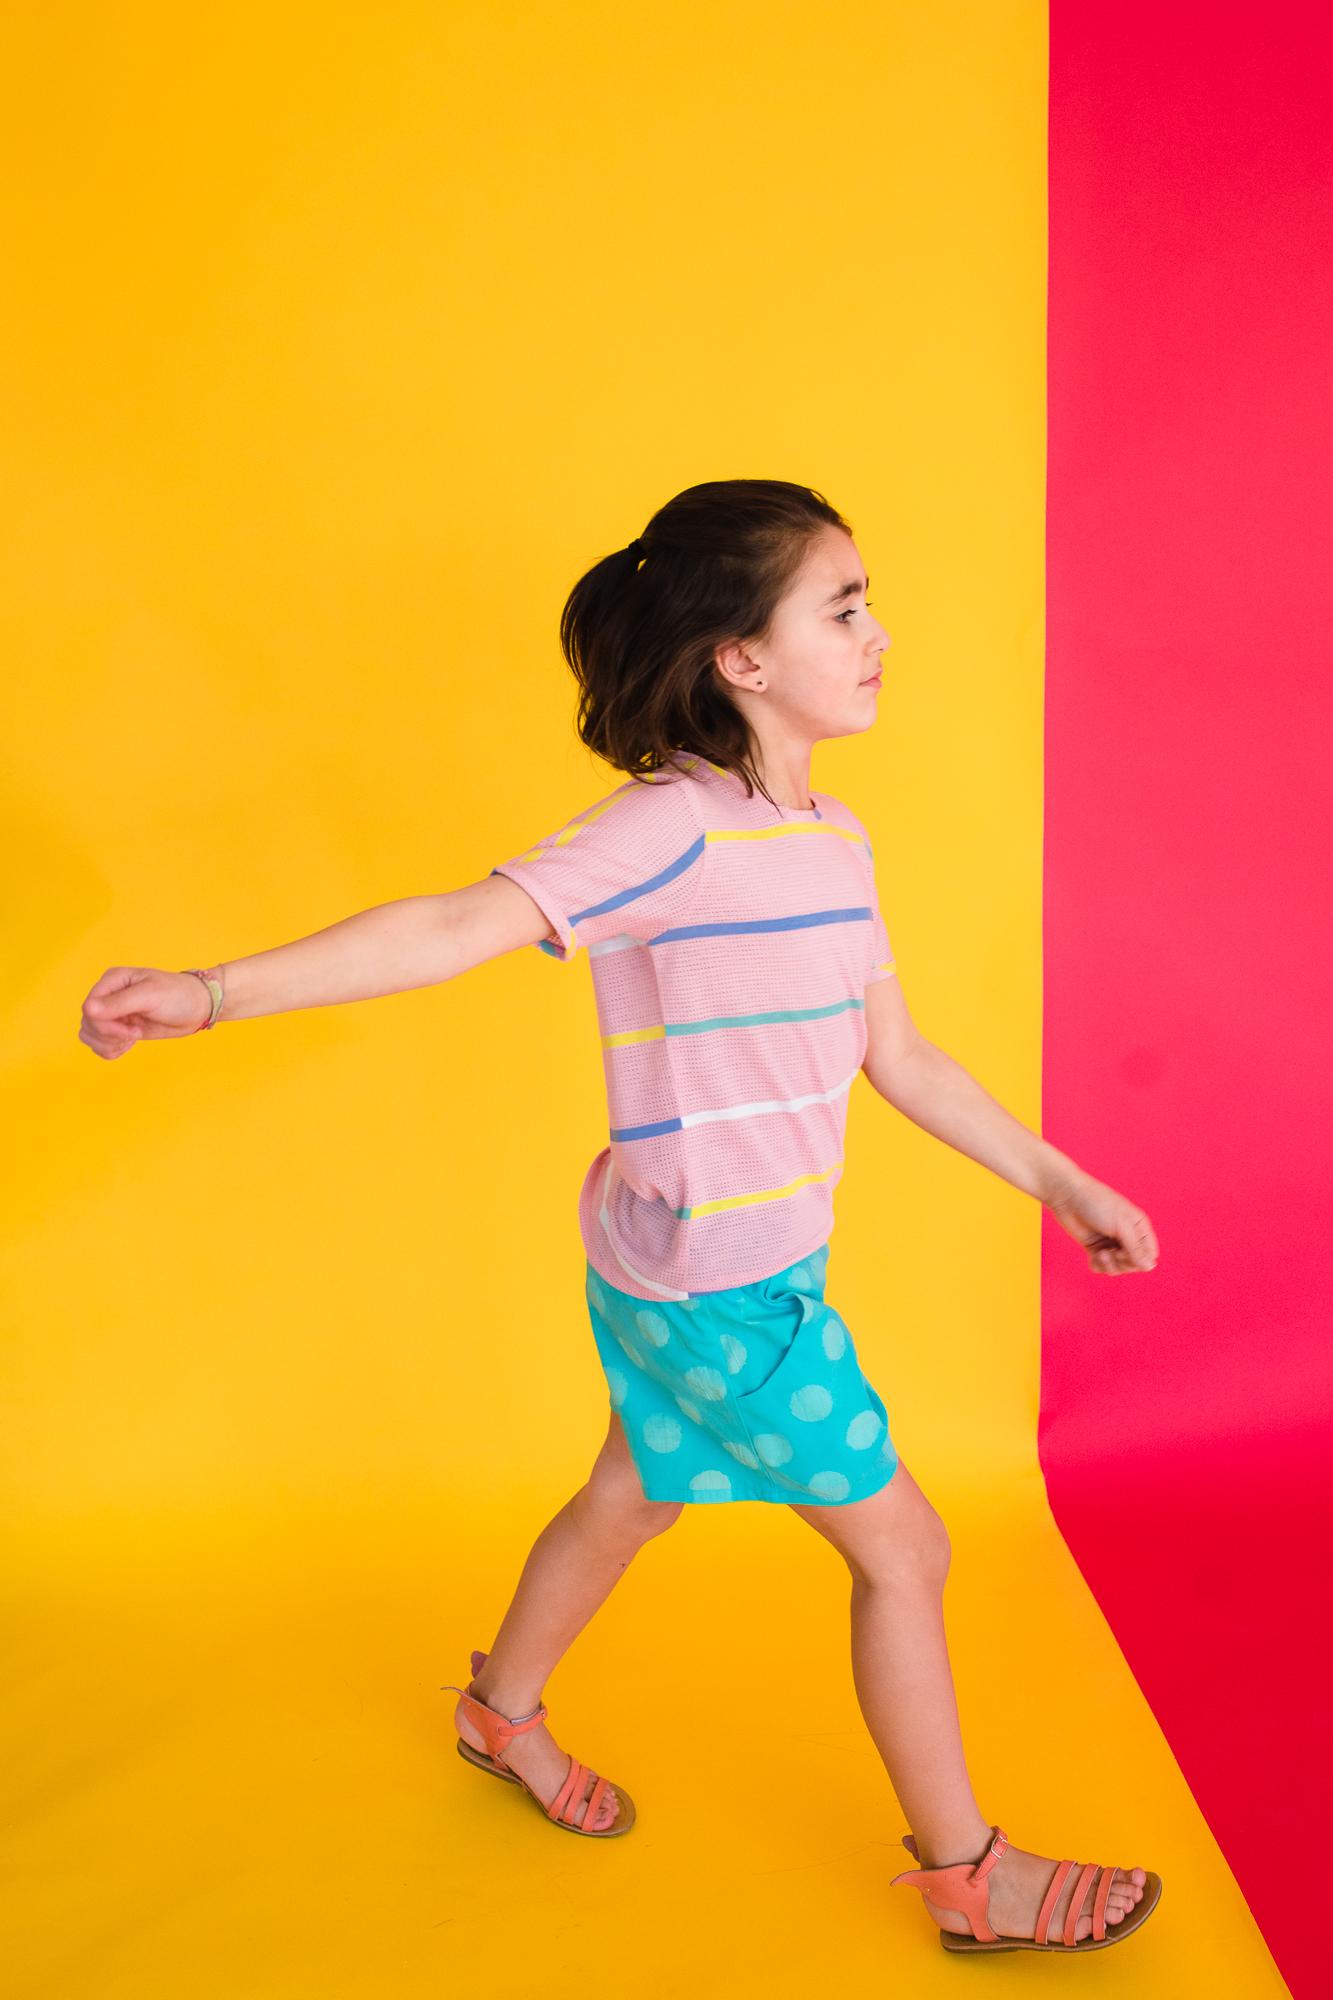 prp-kids-sewing-patterns130.jpg